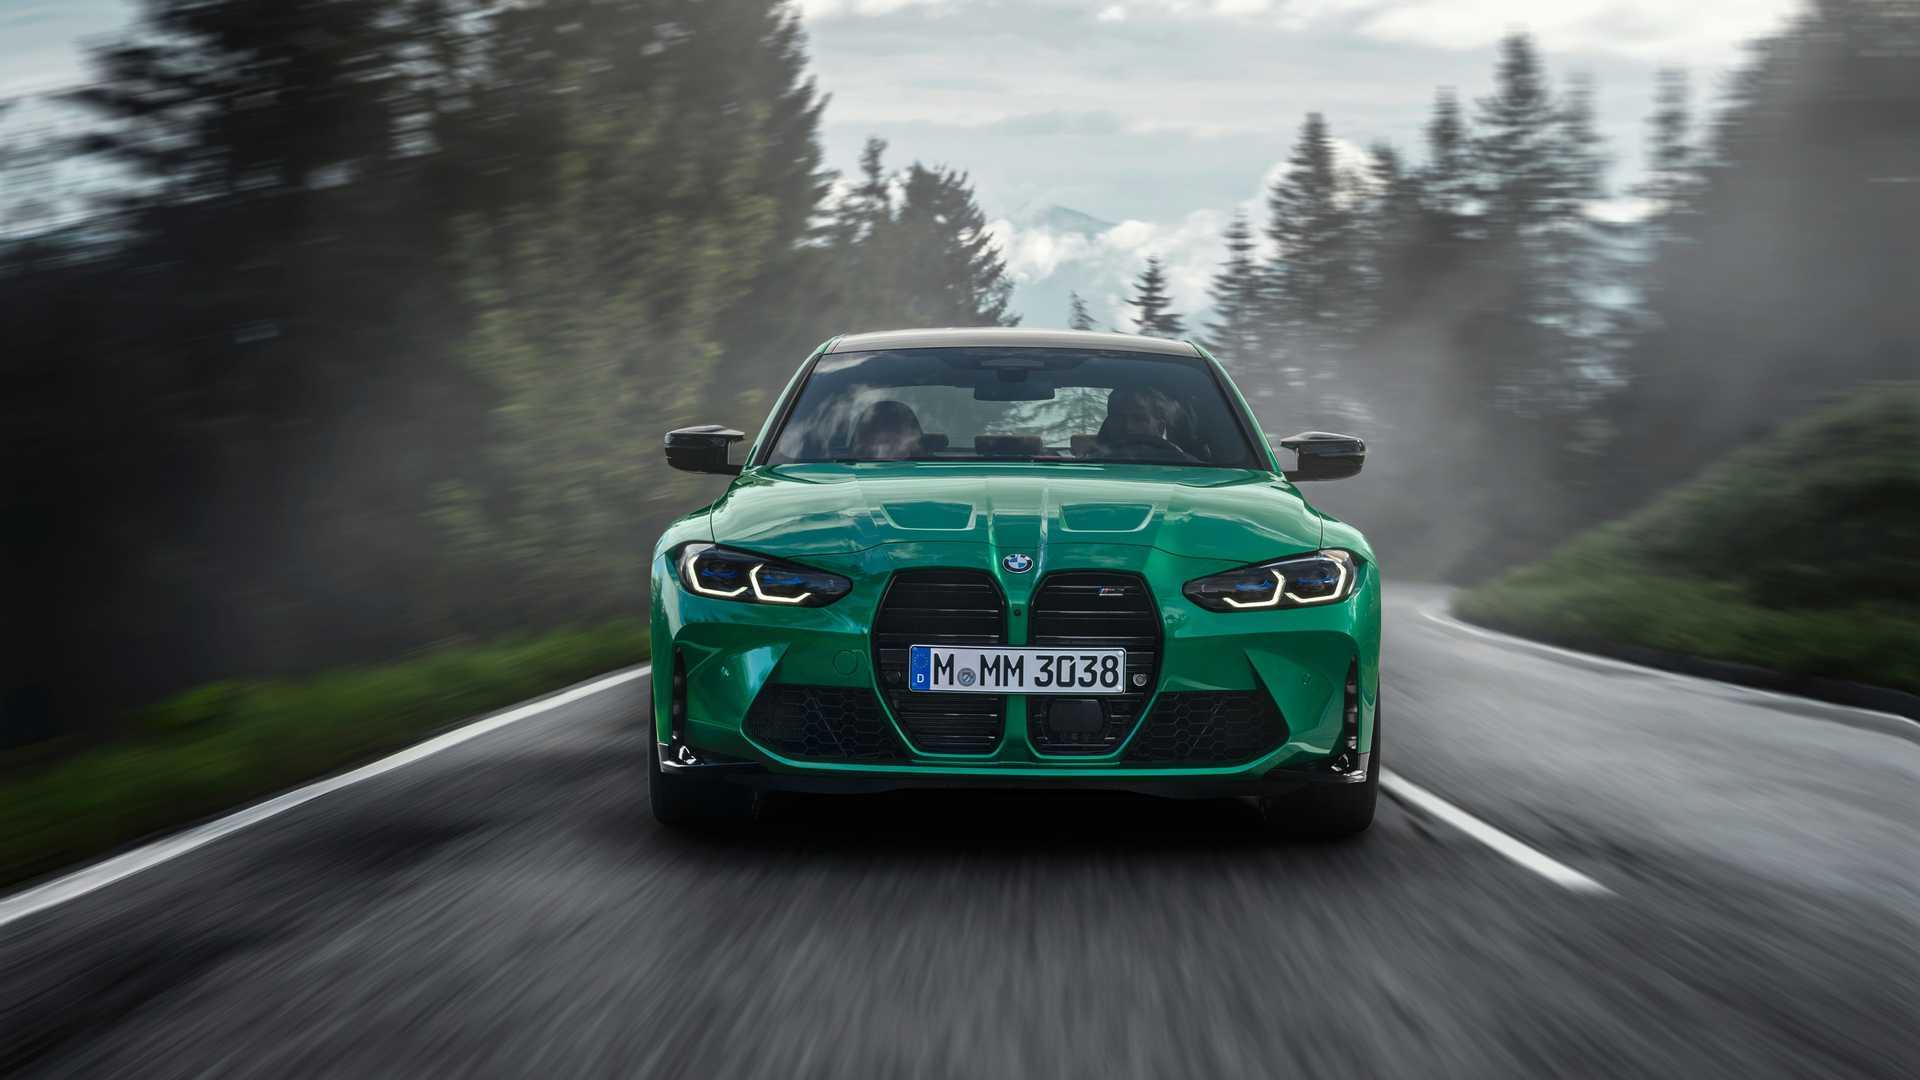 2021 BMW M3 Grille